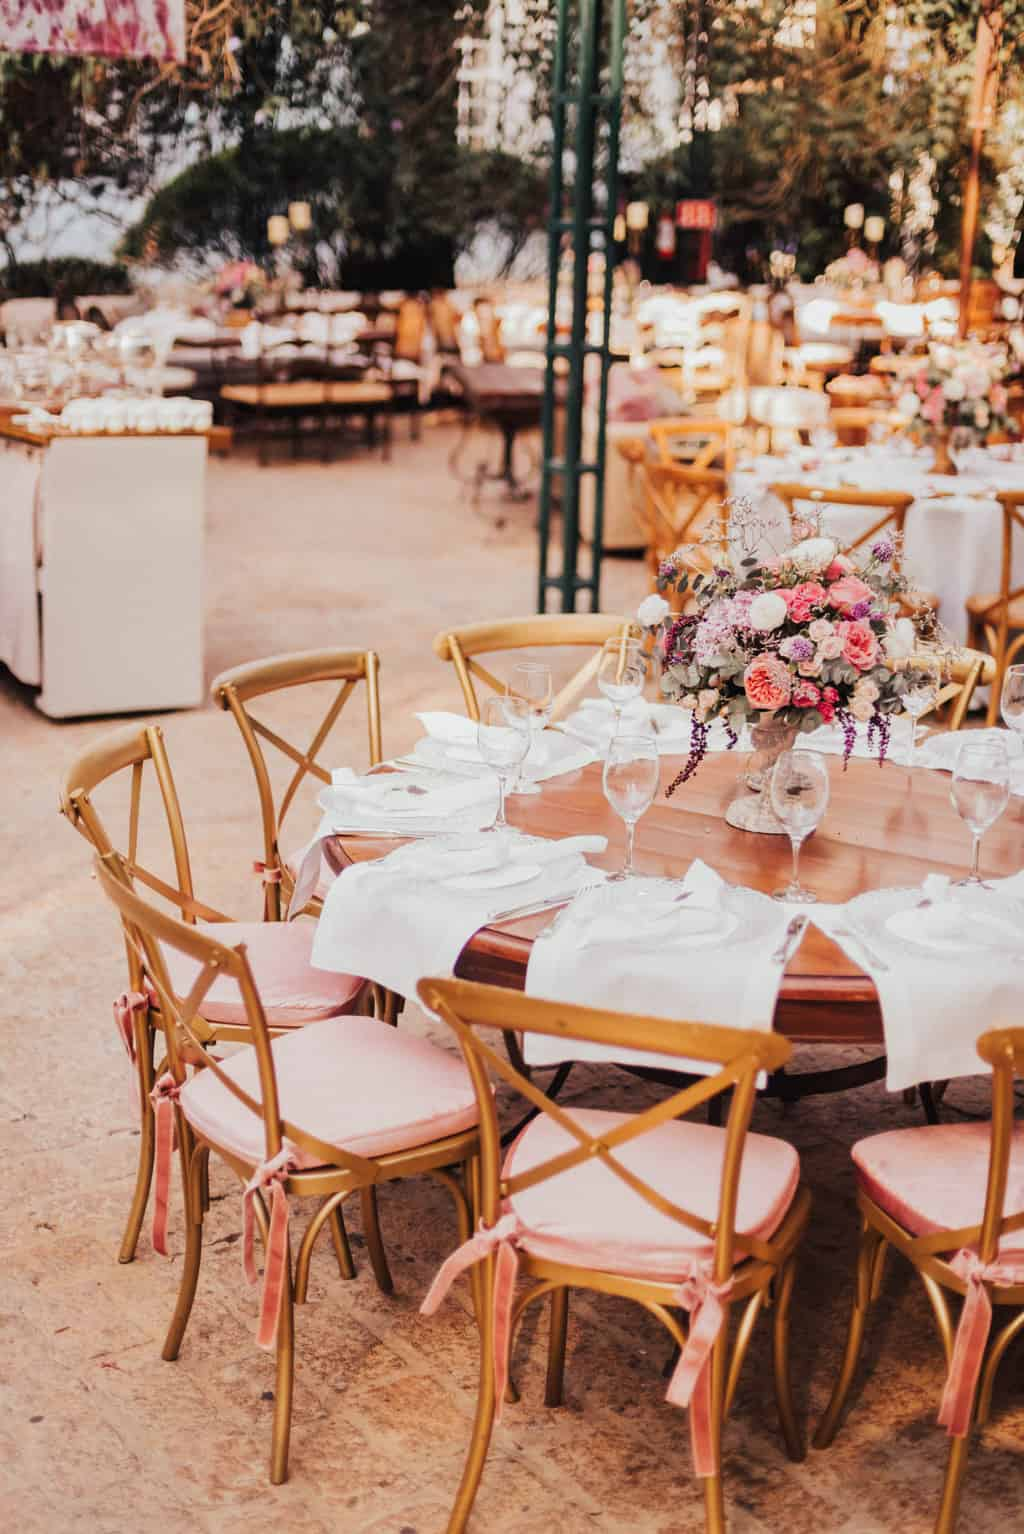 Boutique-de-Cena-casamento-Rebeca-e-Eldrey-Fazenda-Vila-Rica-Fotografia-Mana-Gollo-mesa-dos-convidados-Toda-de-Branco34